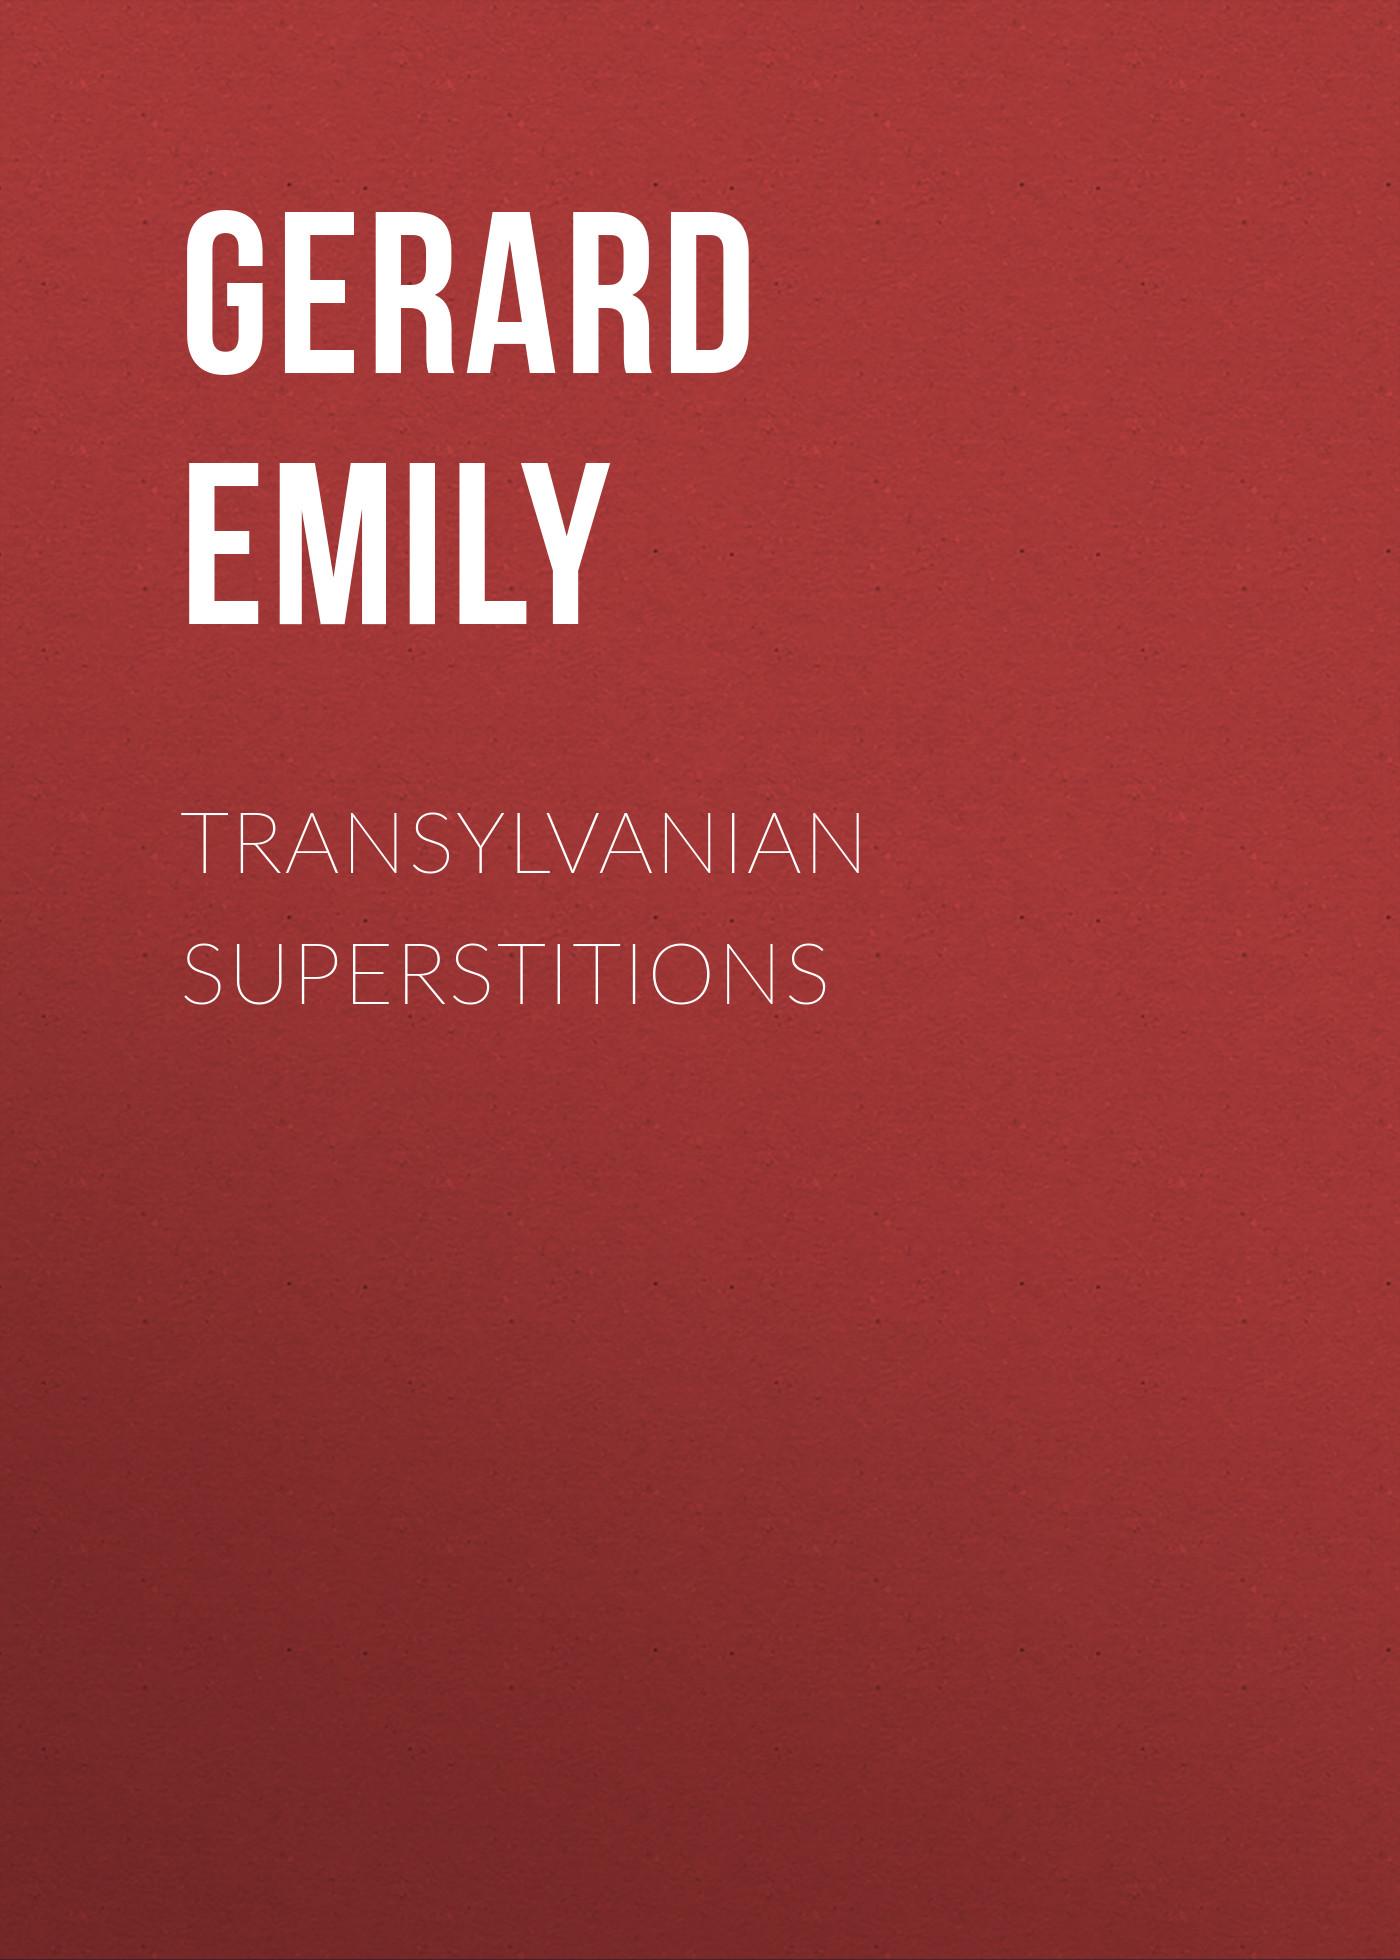 Transylvanian Superstitions